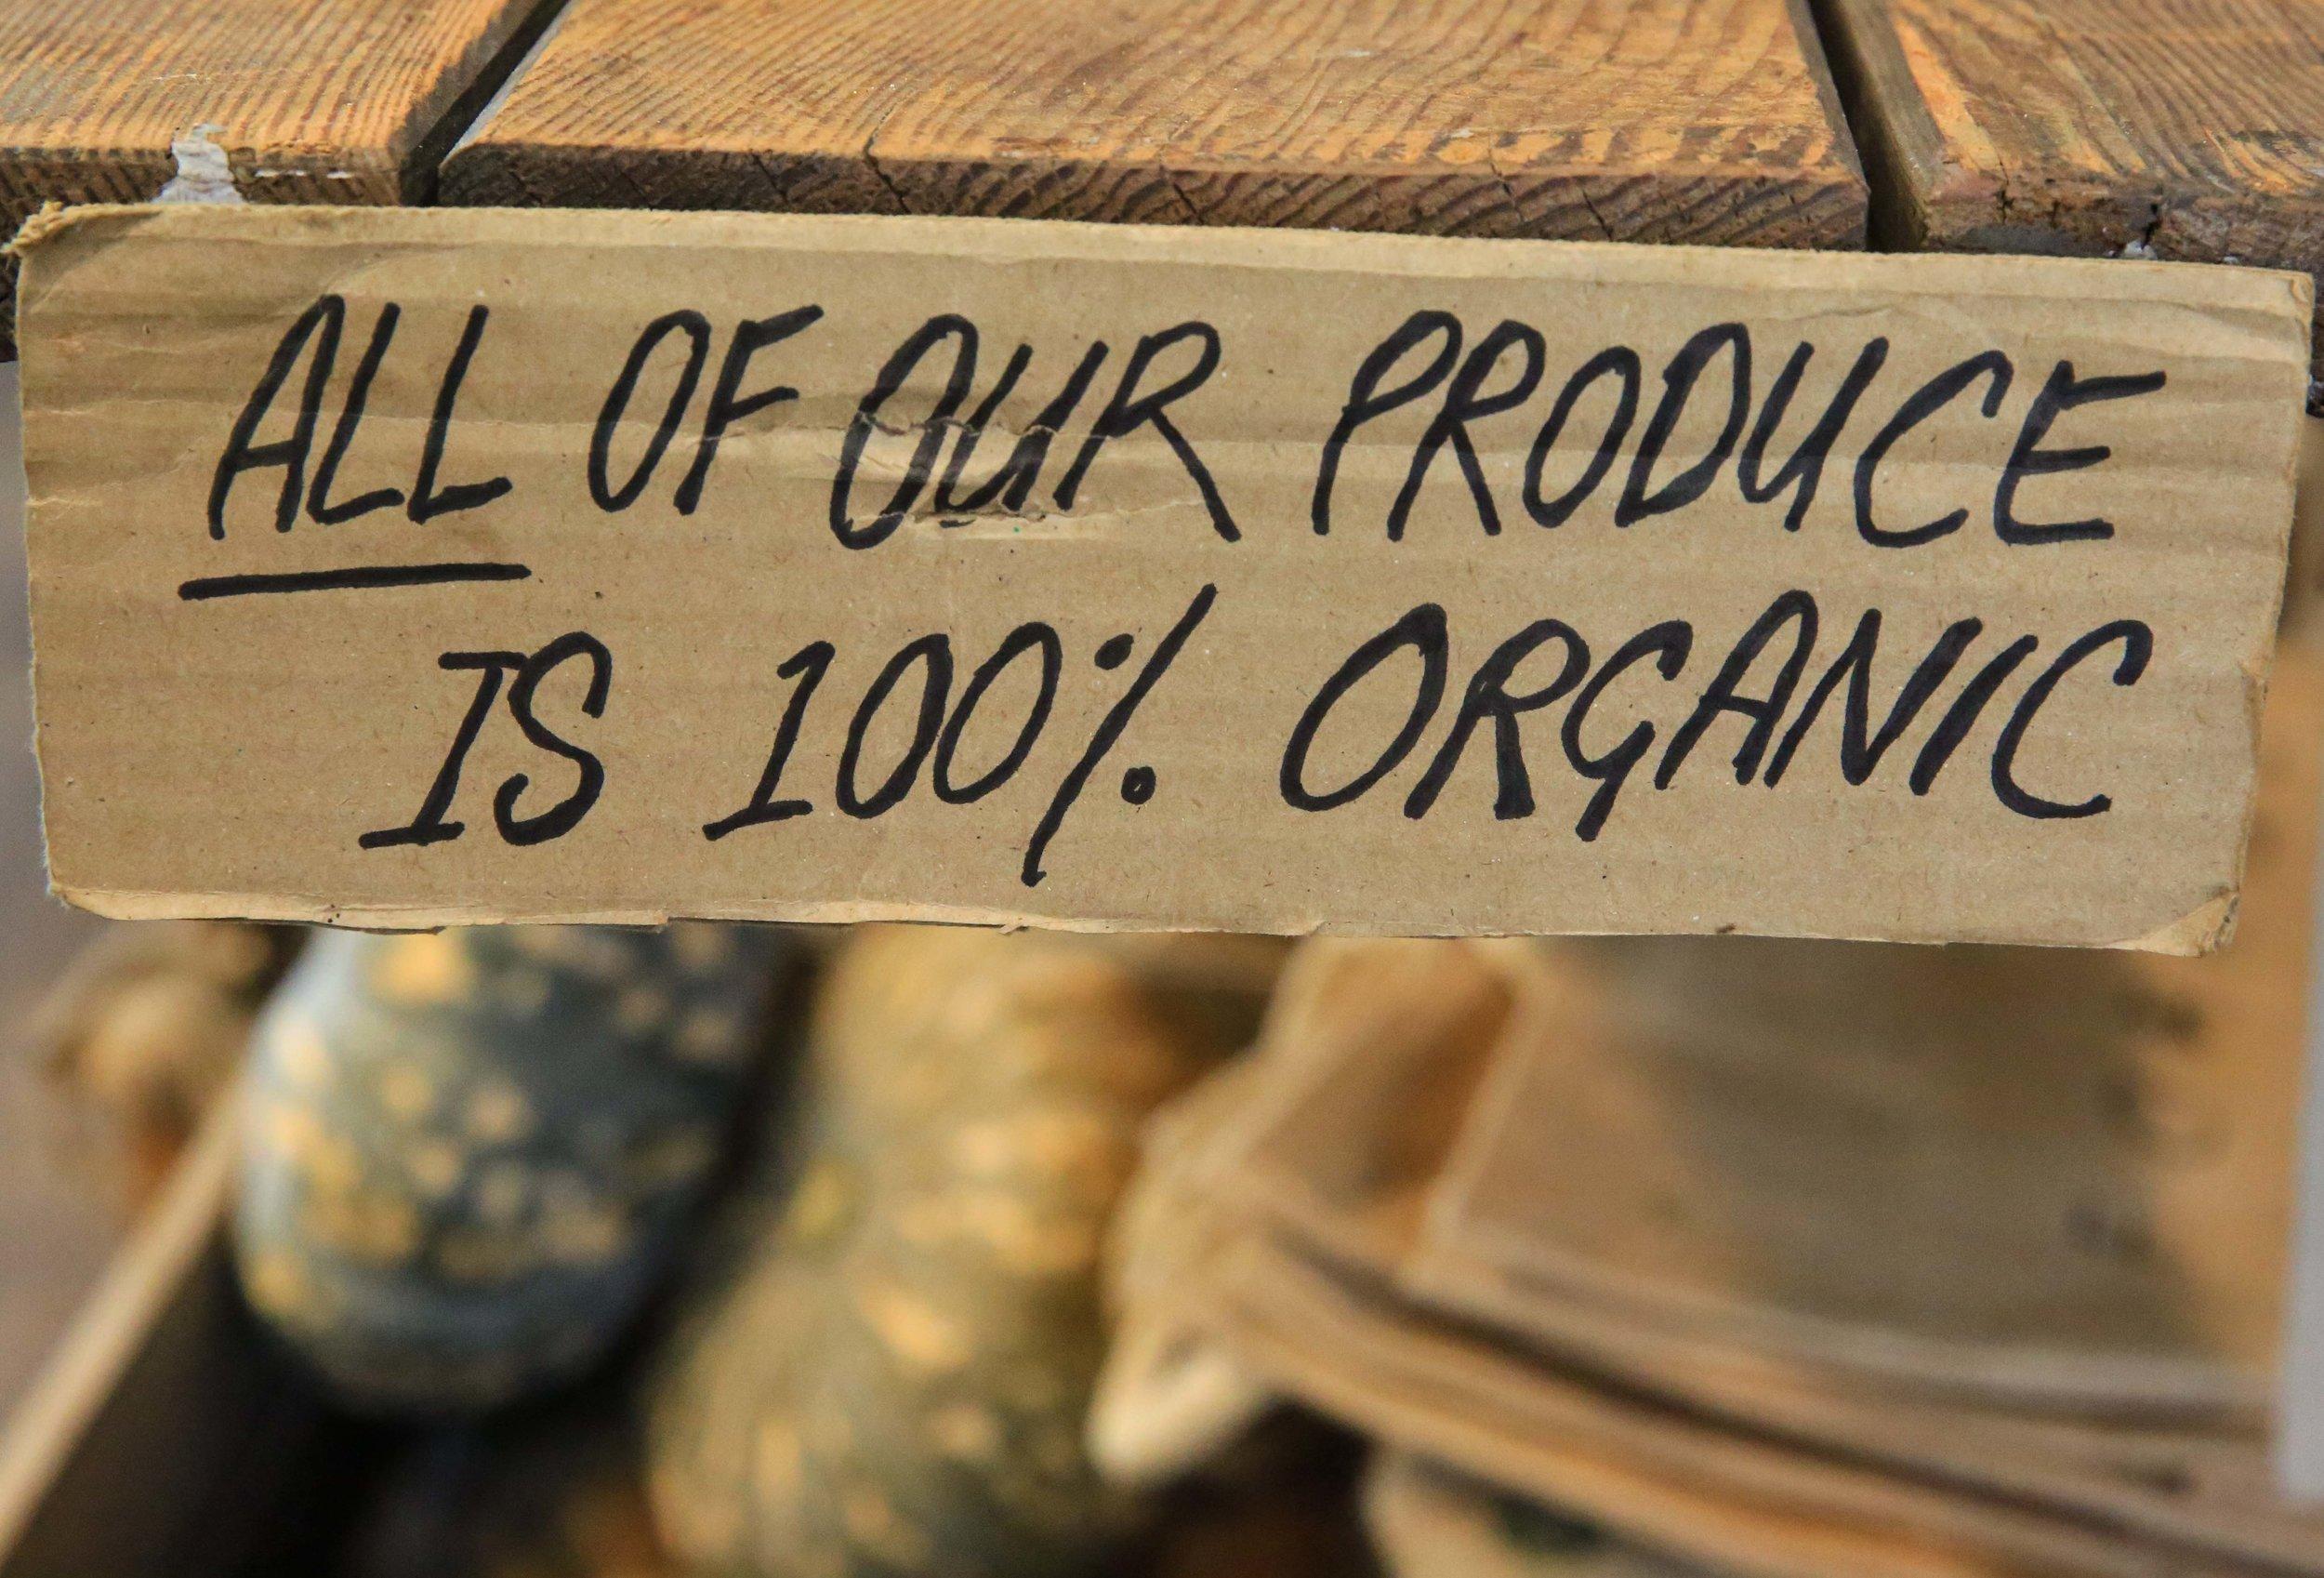 Forage Grocer Produce Sign.jpg